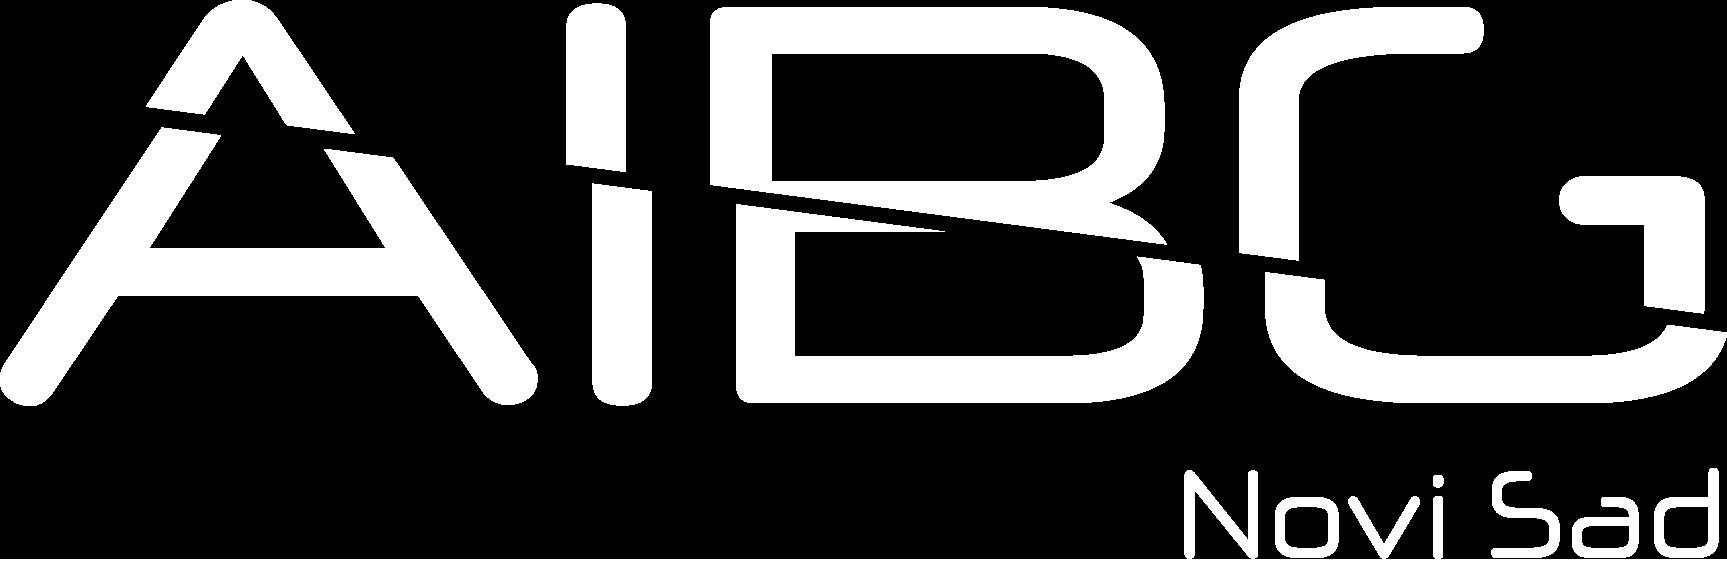 AIBG 2021 Novi Sad logo